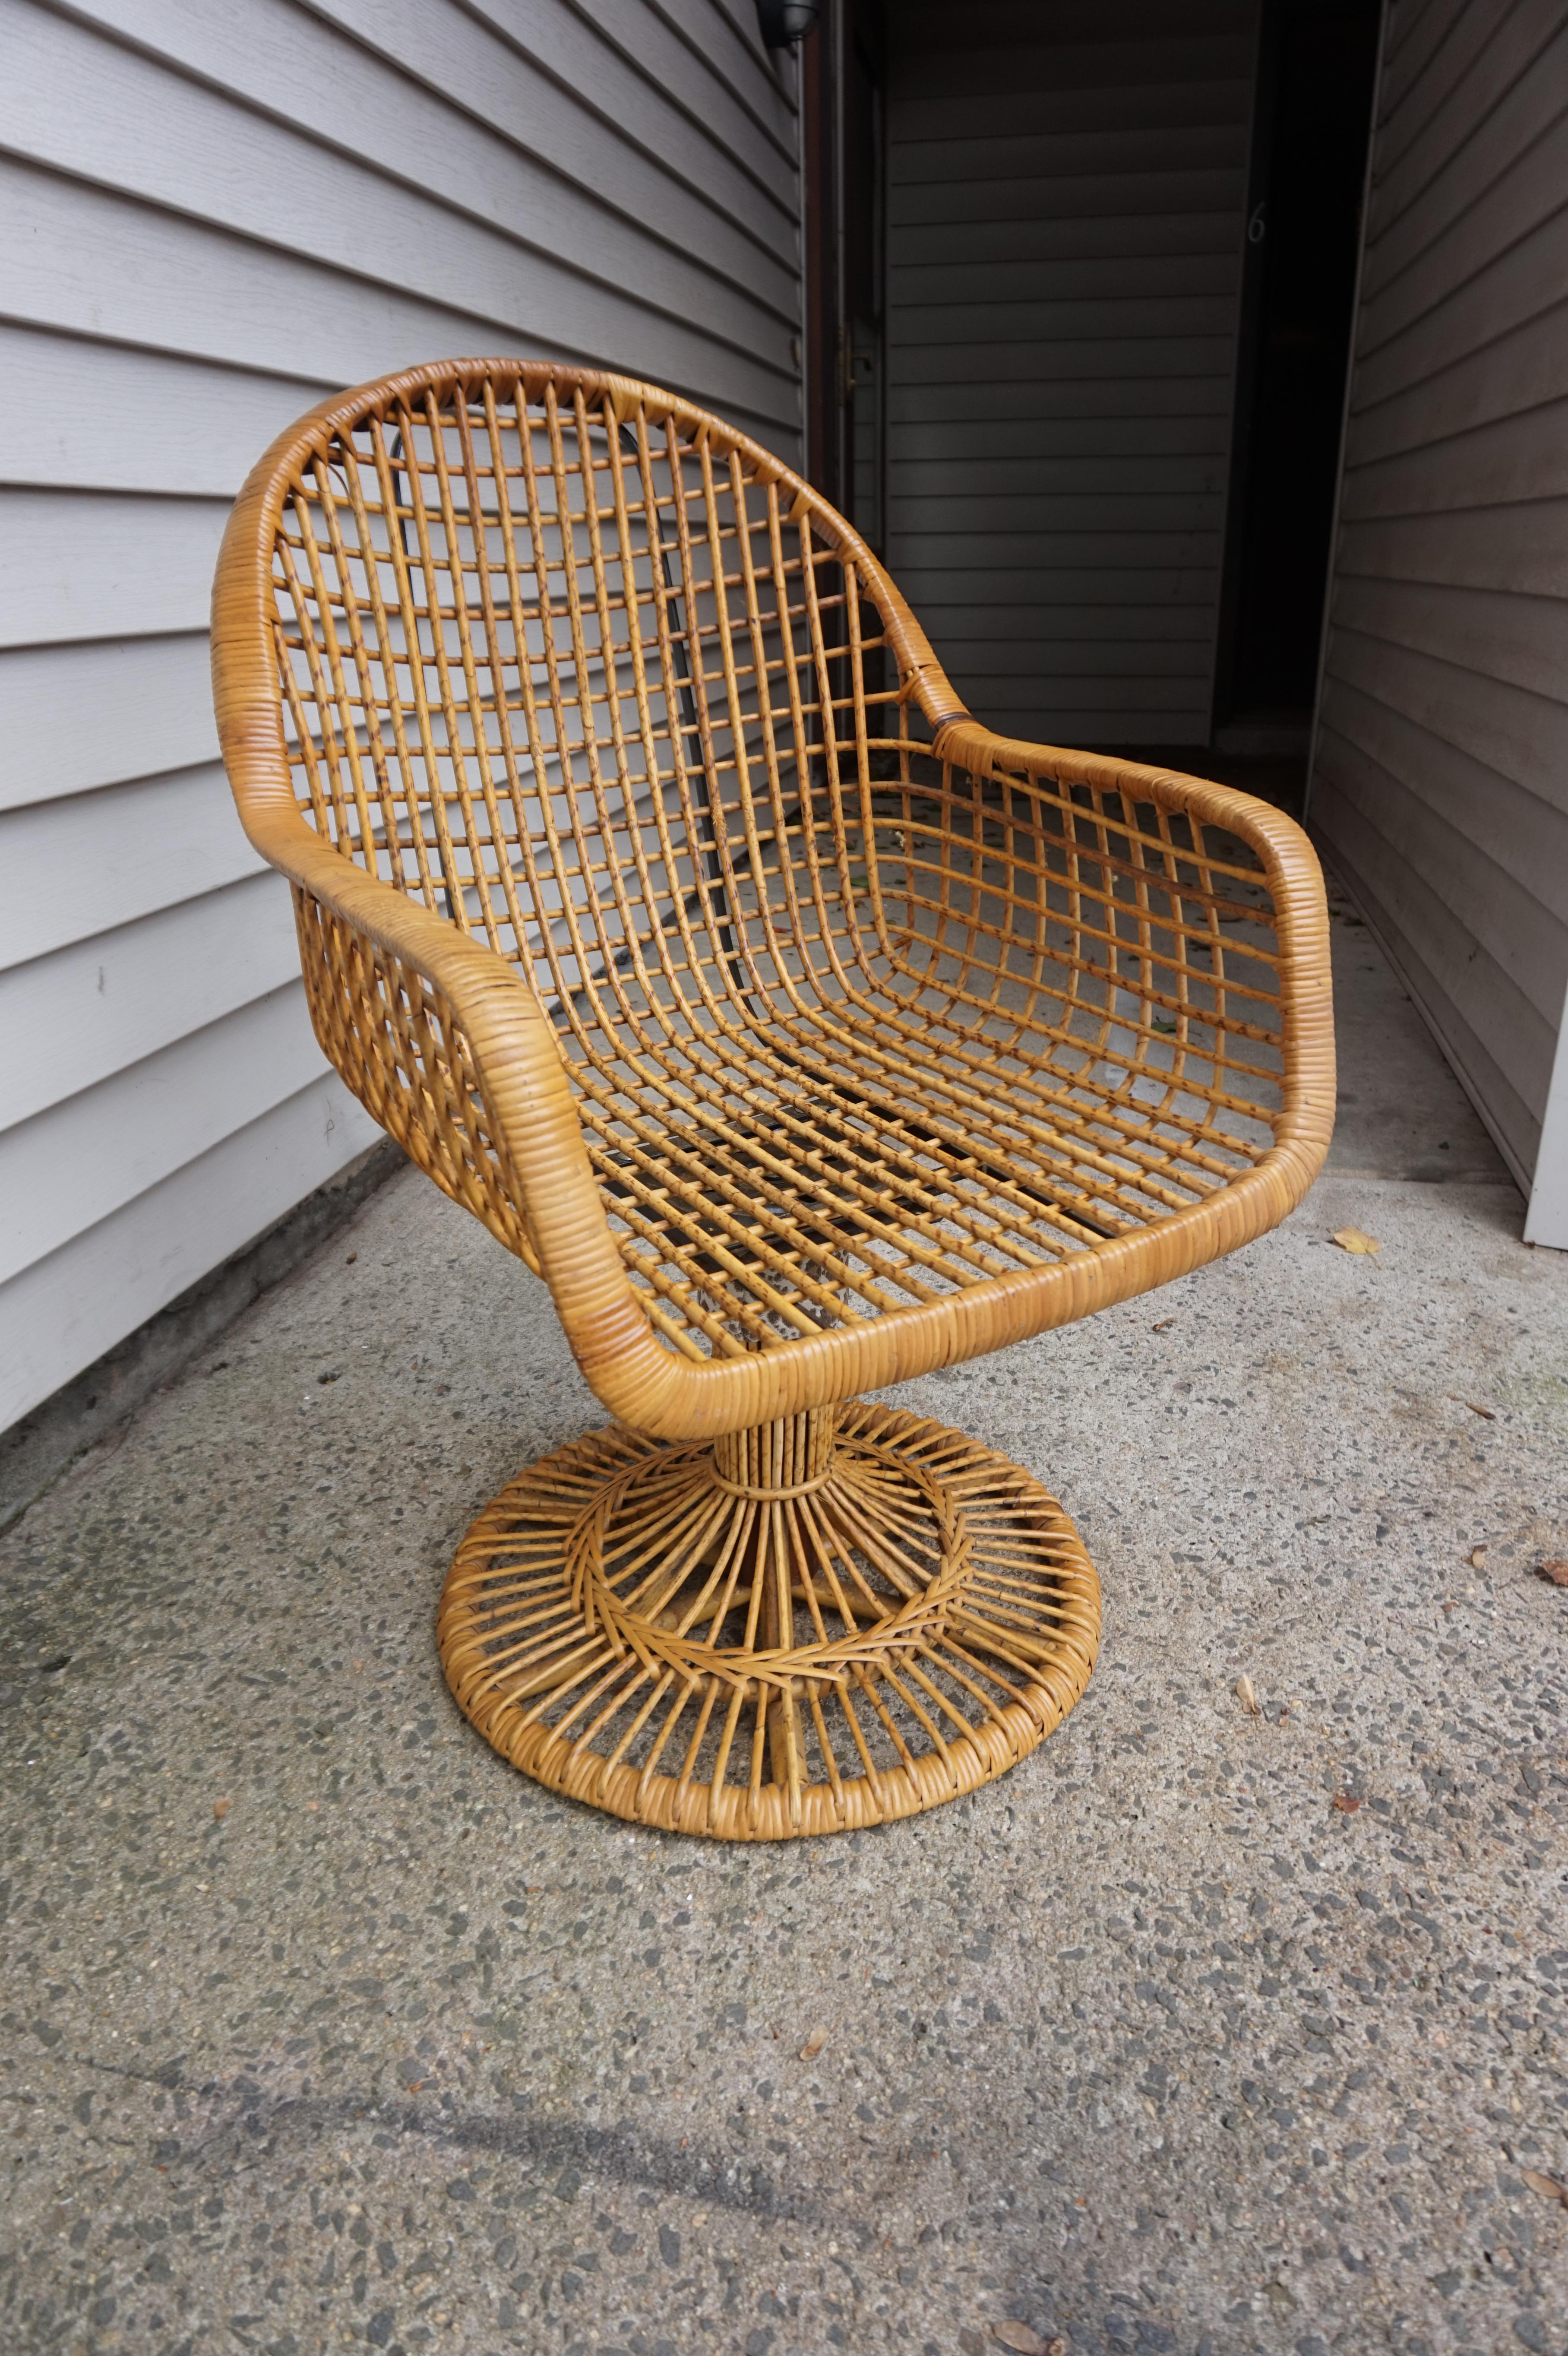 Franco Albini Era Bamboo Swivel Chair Chairish Chair Swivel Chair Shabby Chic Table And Chairs